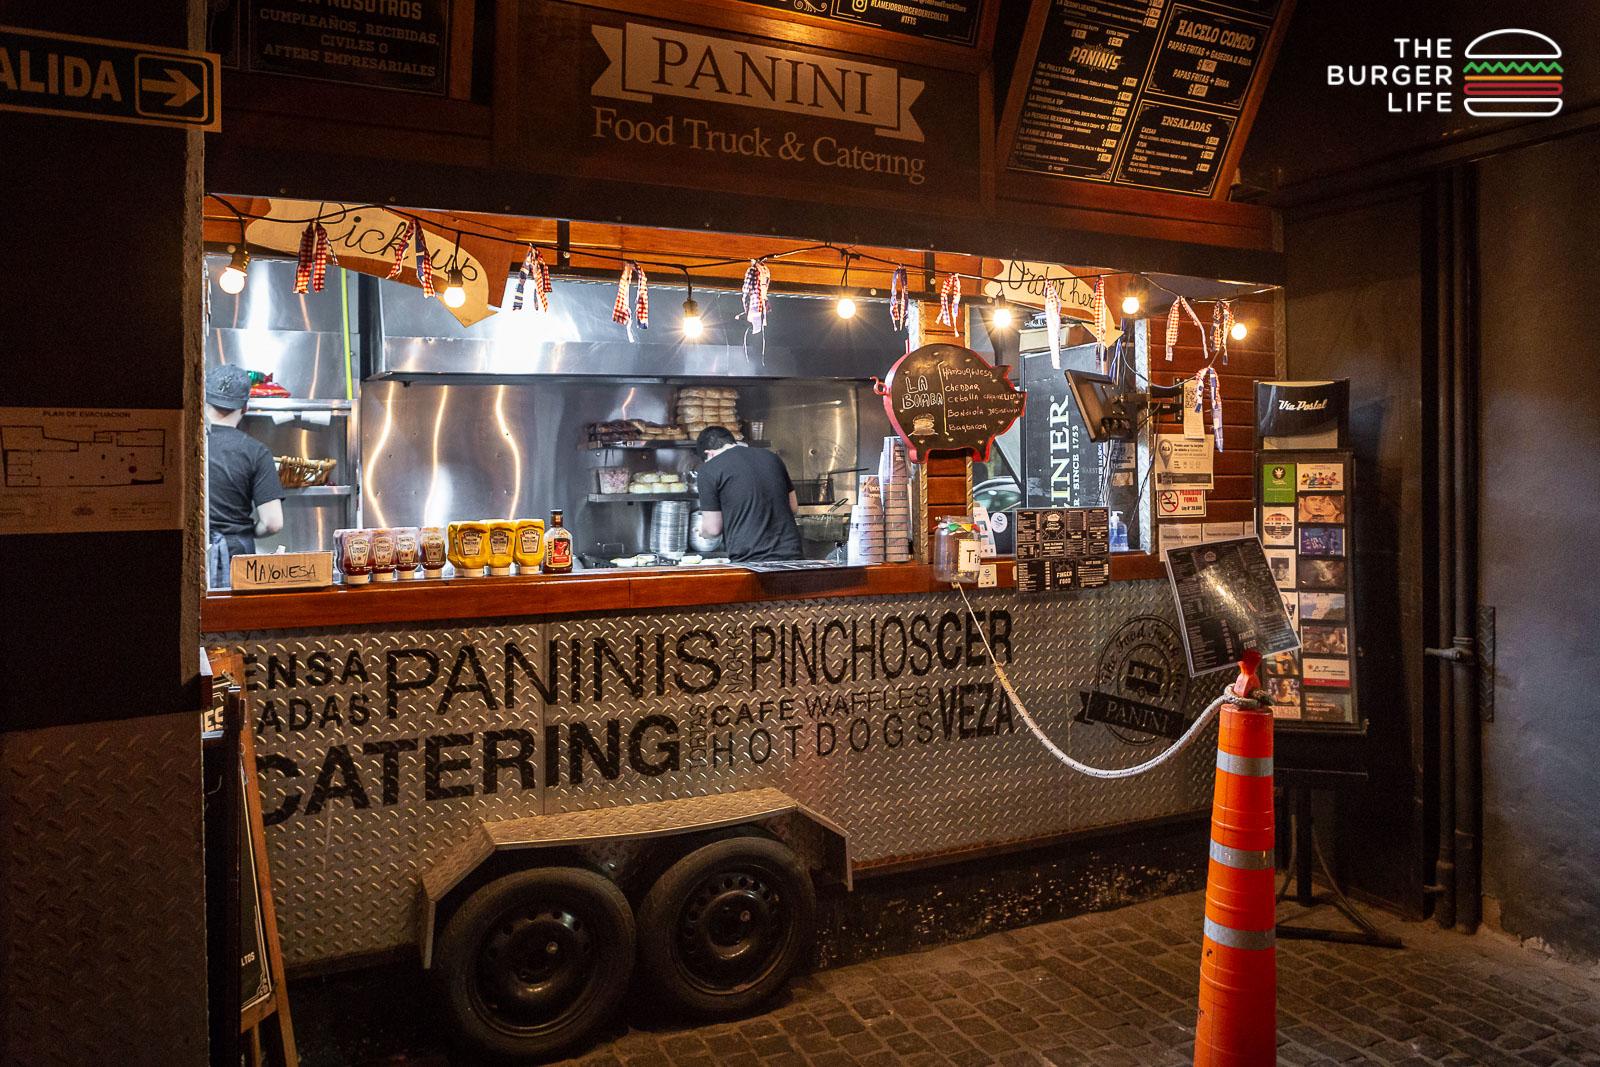 The Food Truck Store Panini Recoleta